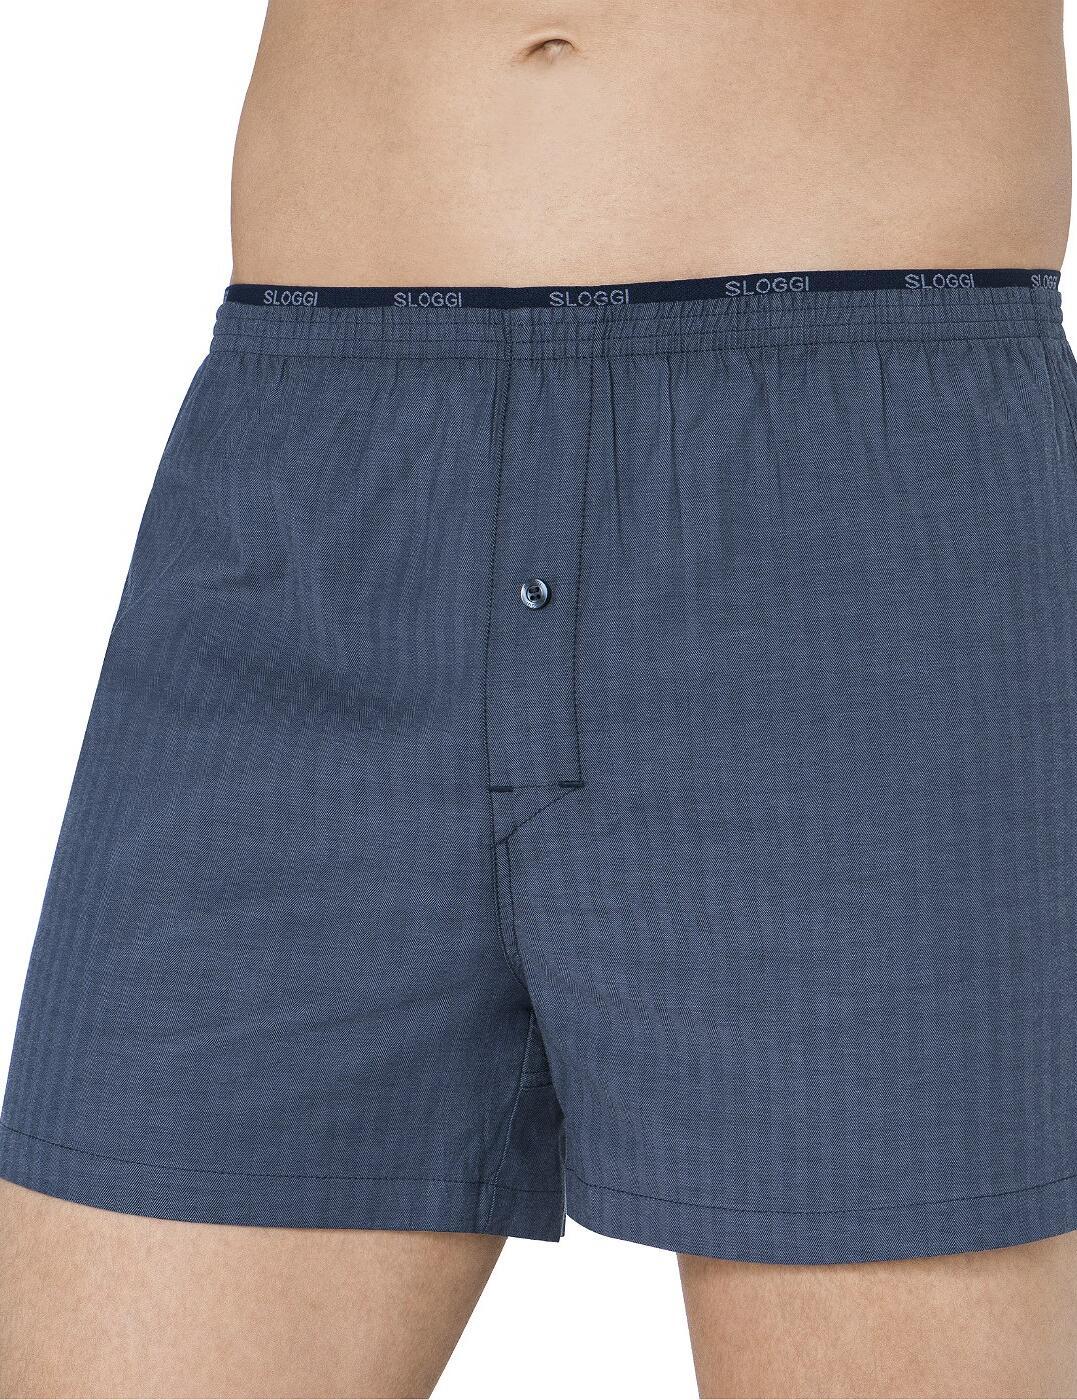 10154631 Sloggi Men Freedom Stretch Boxer Short - 10154631 Blue/Light Combination